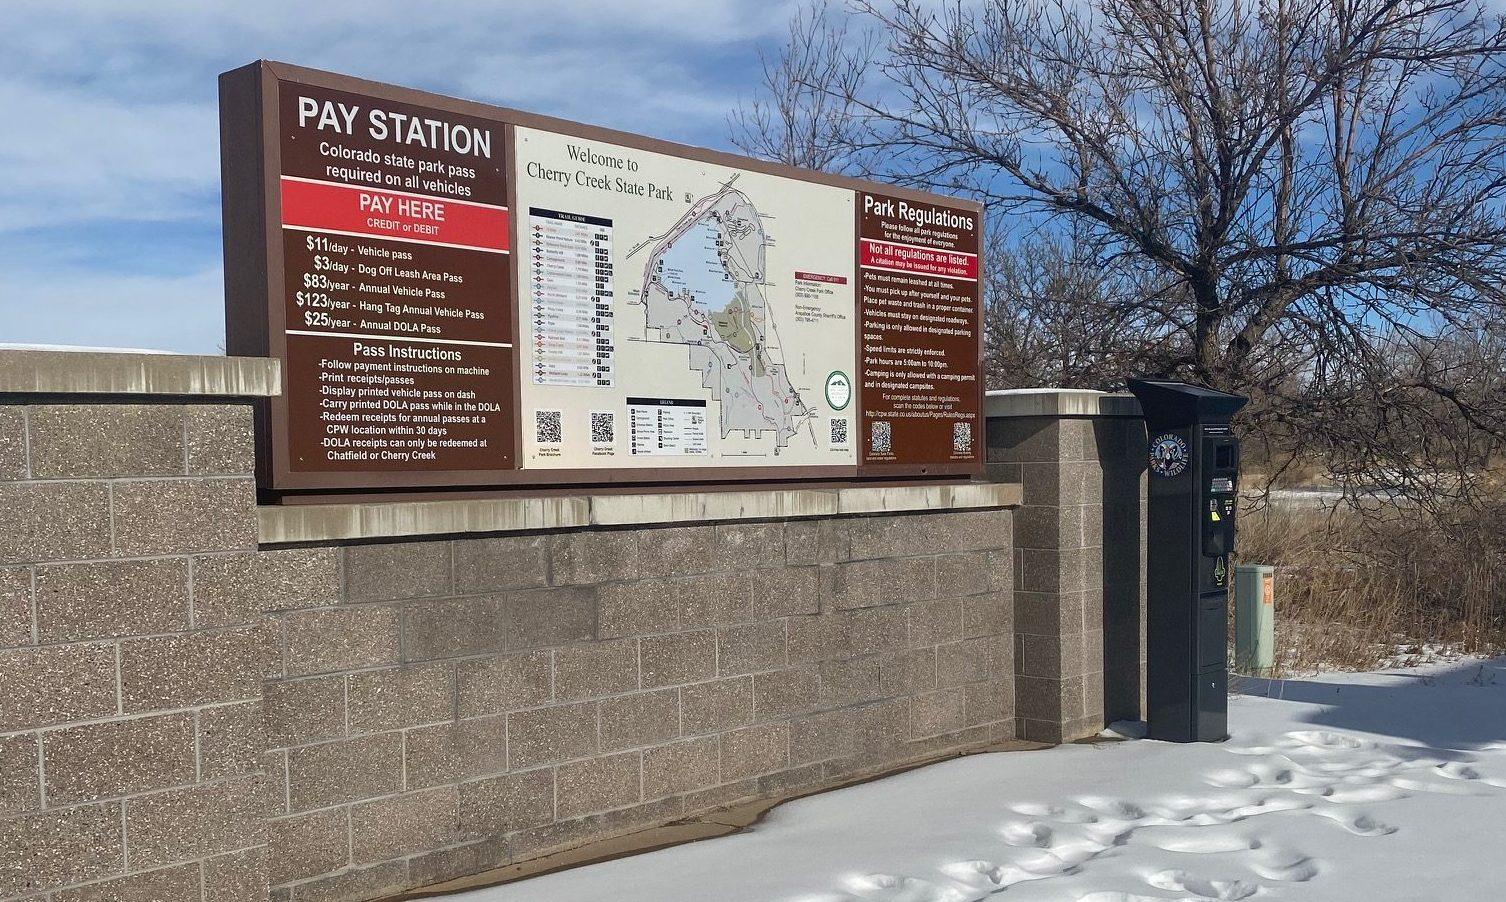 Colorado State Parks A Case Study